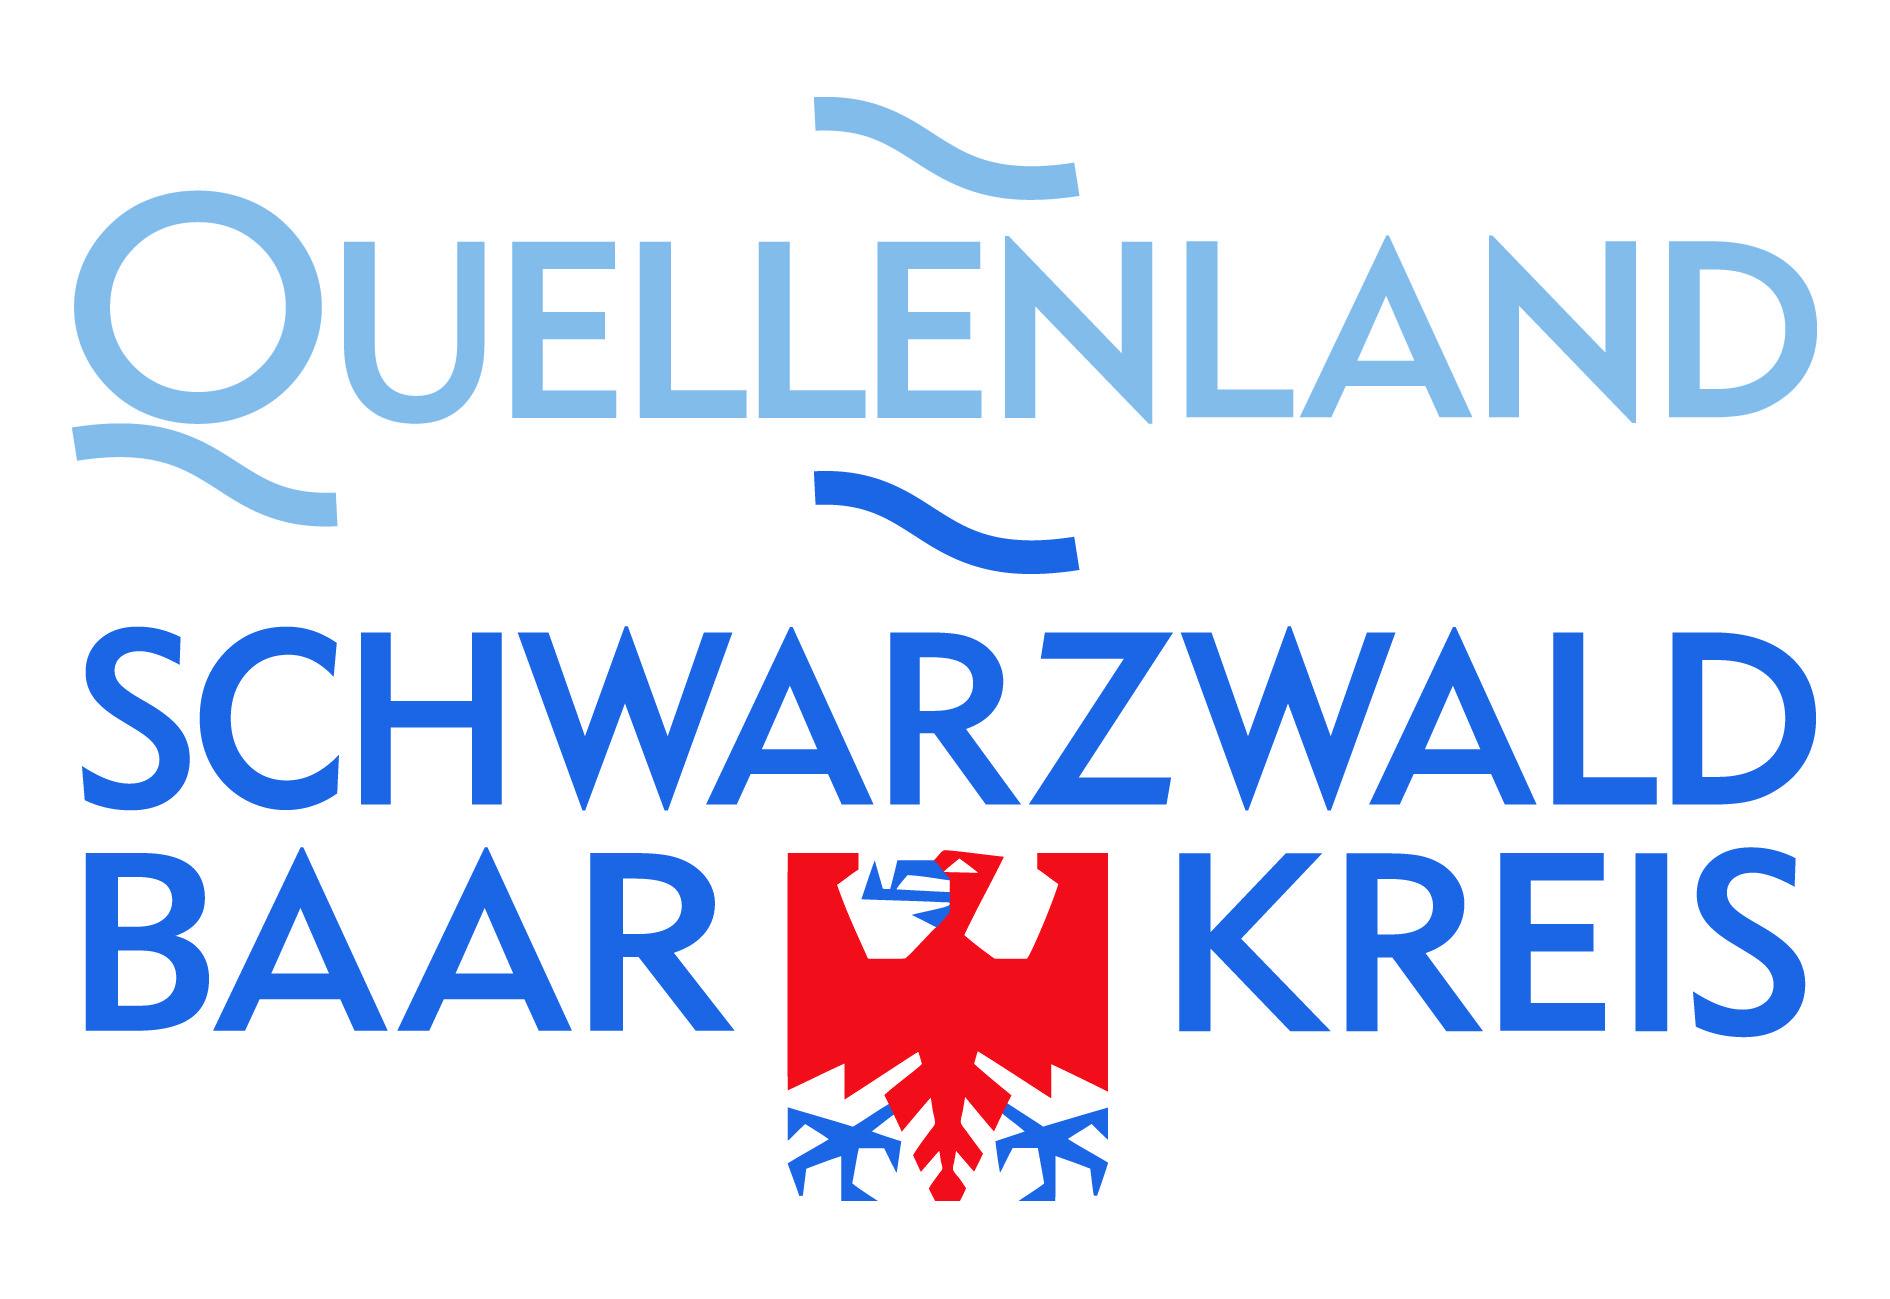 https://www.betreuung-und-pflege.de/app/files/2021/02/Quellenland-Schwarzwald-Baar-Kreis.jpg